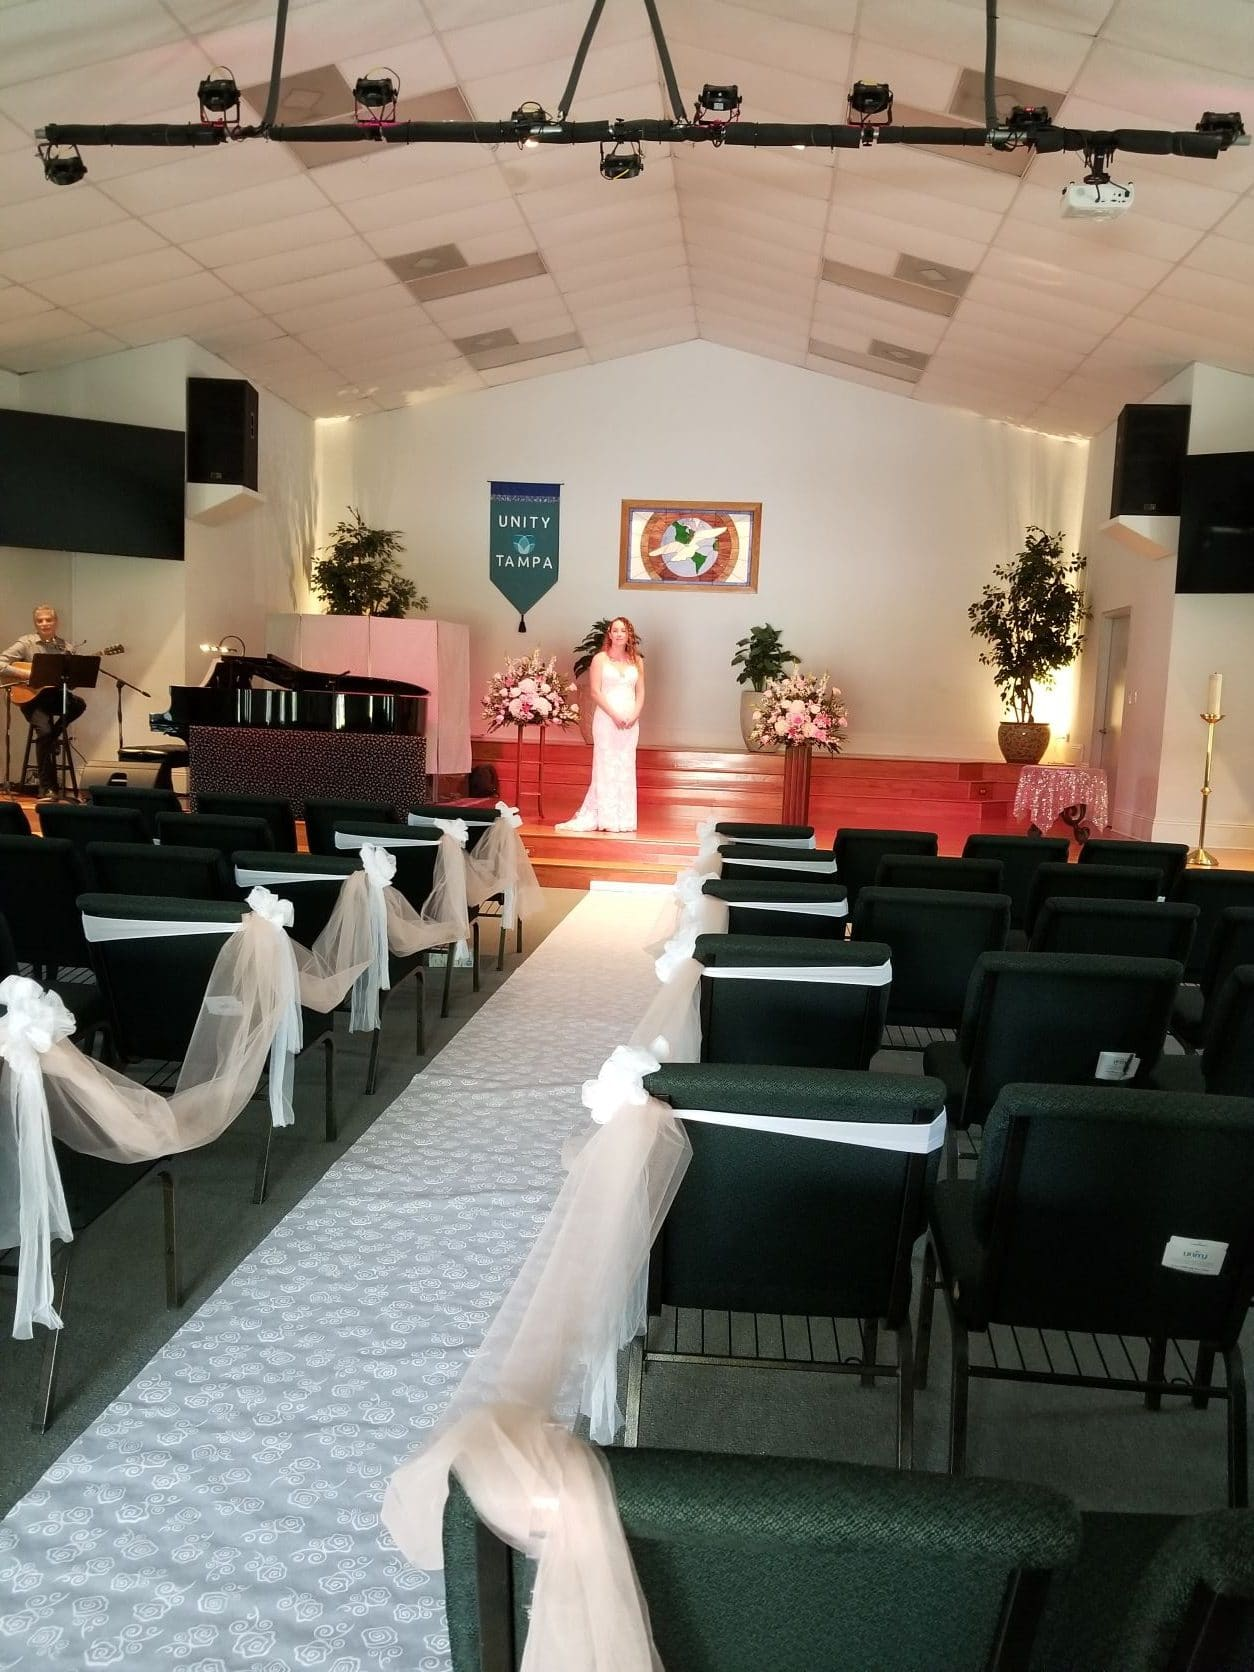 Unity of Tampa Sanctuary Wedding